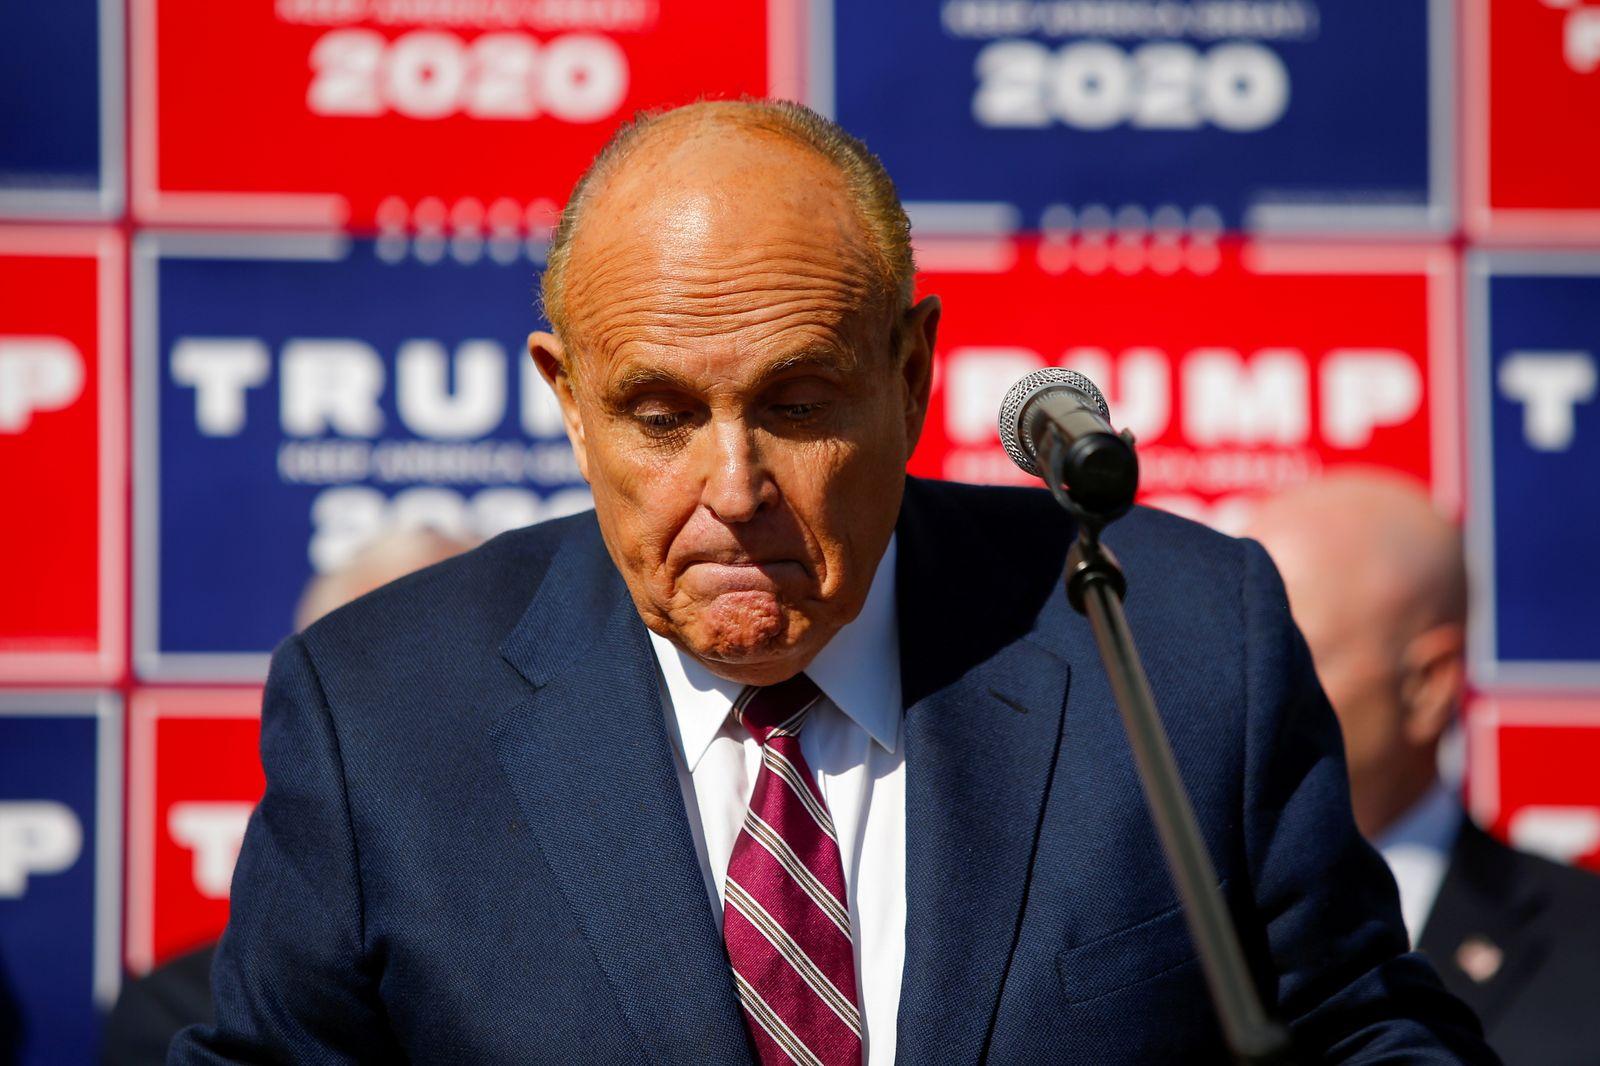 FILE PHOTO: Former New York City Mayor Rudy Giuliani, personal attorney to U.S. President Donald Trump speaks in Philadelphia